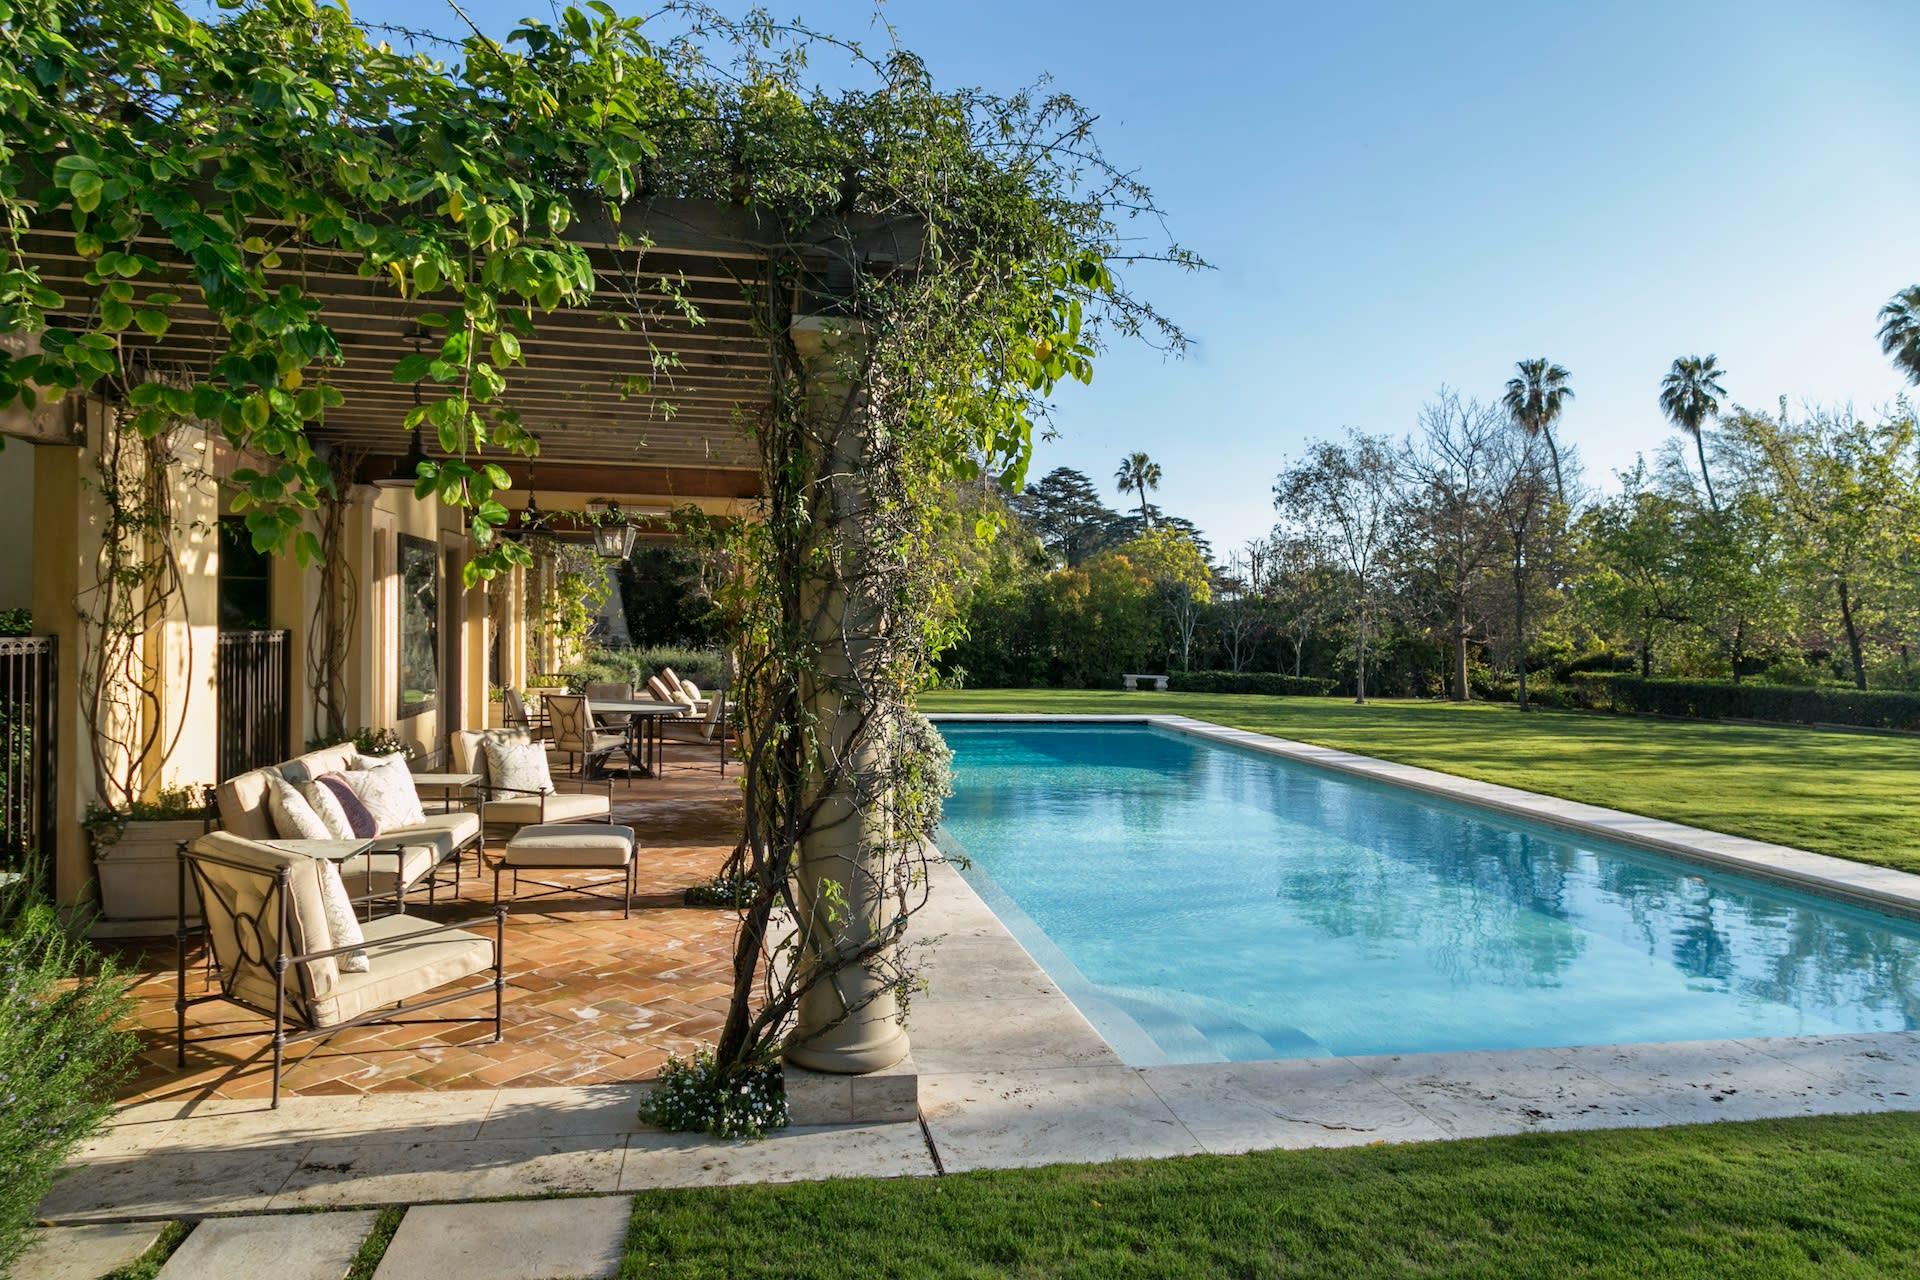 Additional photo for property listing at 334 S Burlingame Ave 334 S Burlingame Ave Los Angeles, Californië,90049 Verenigde Staten